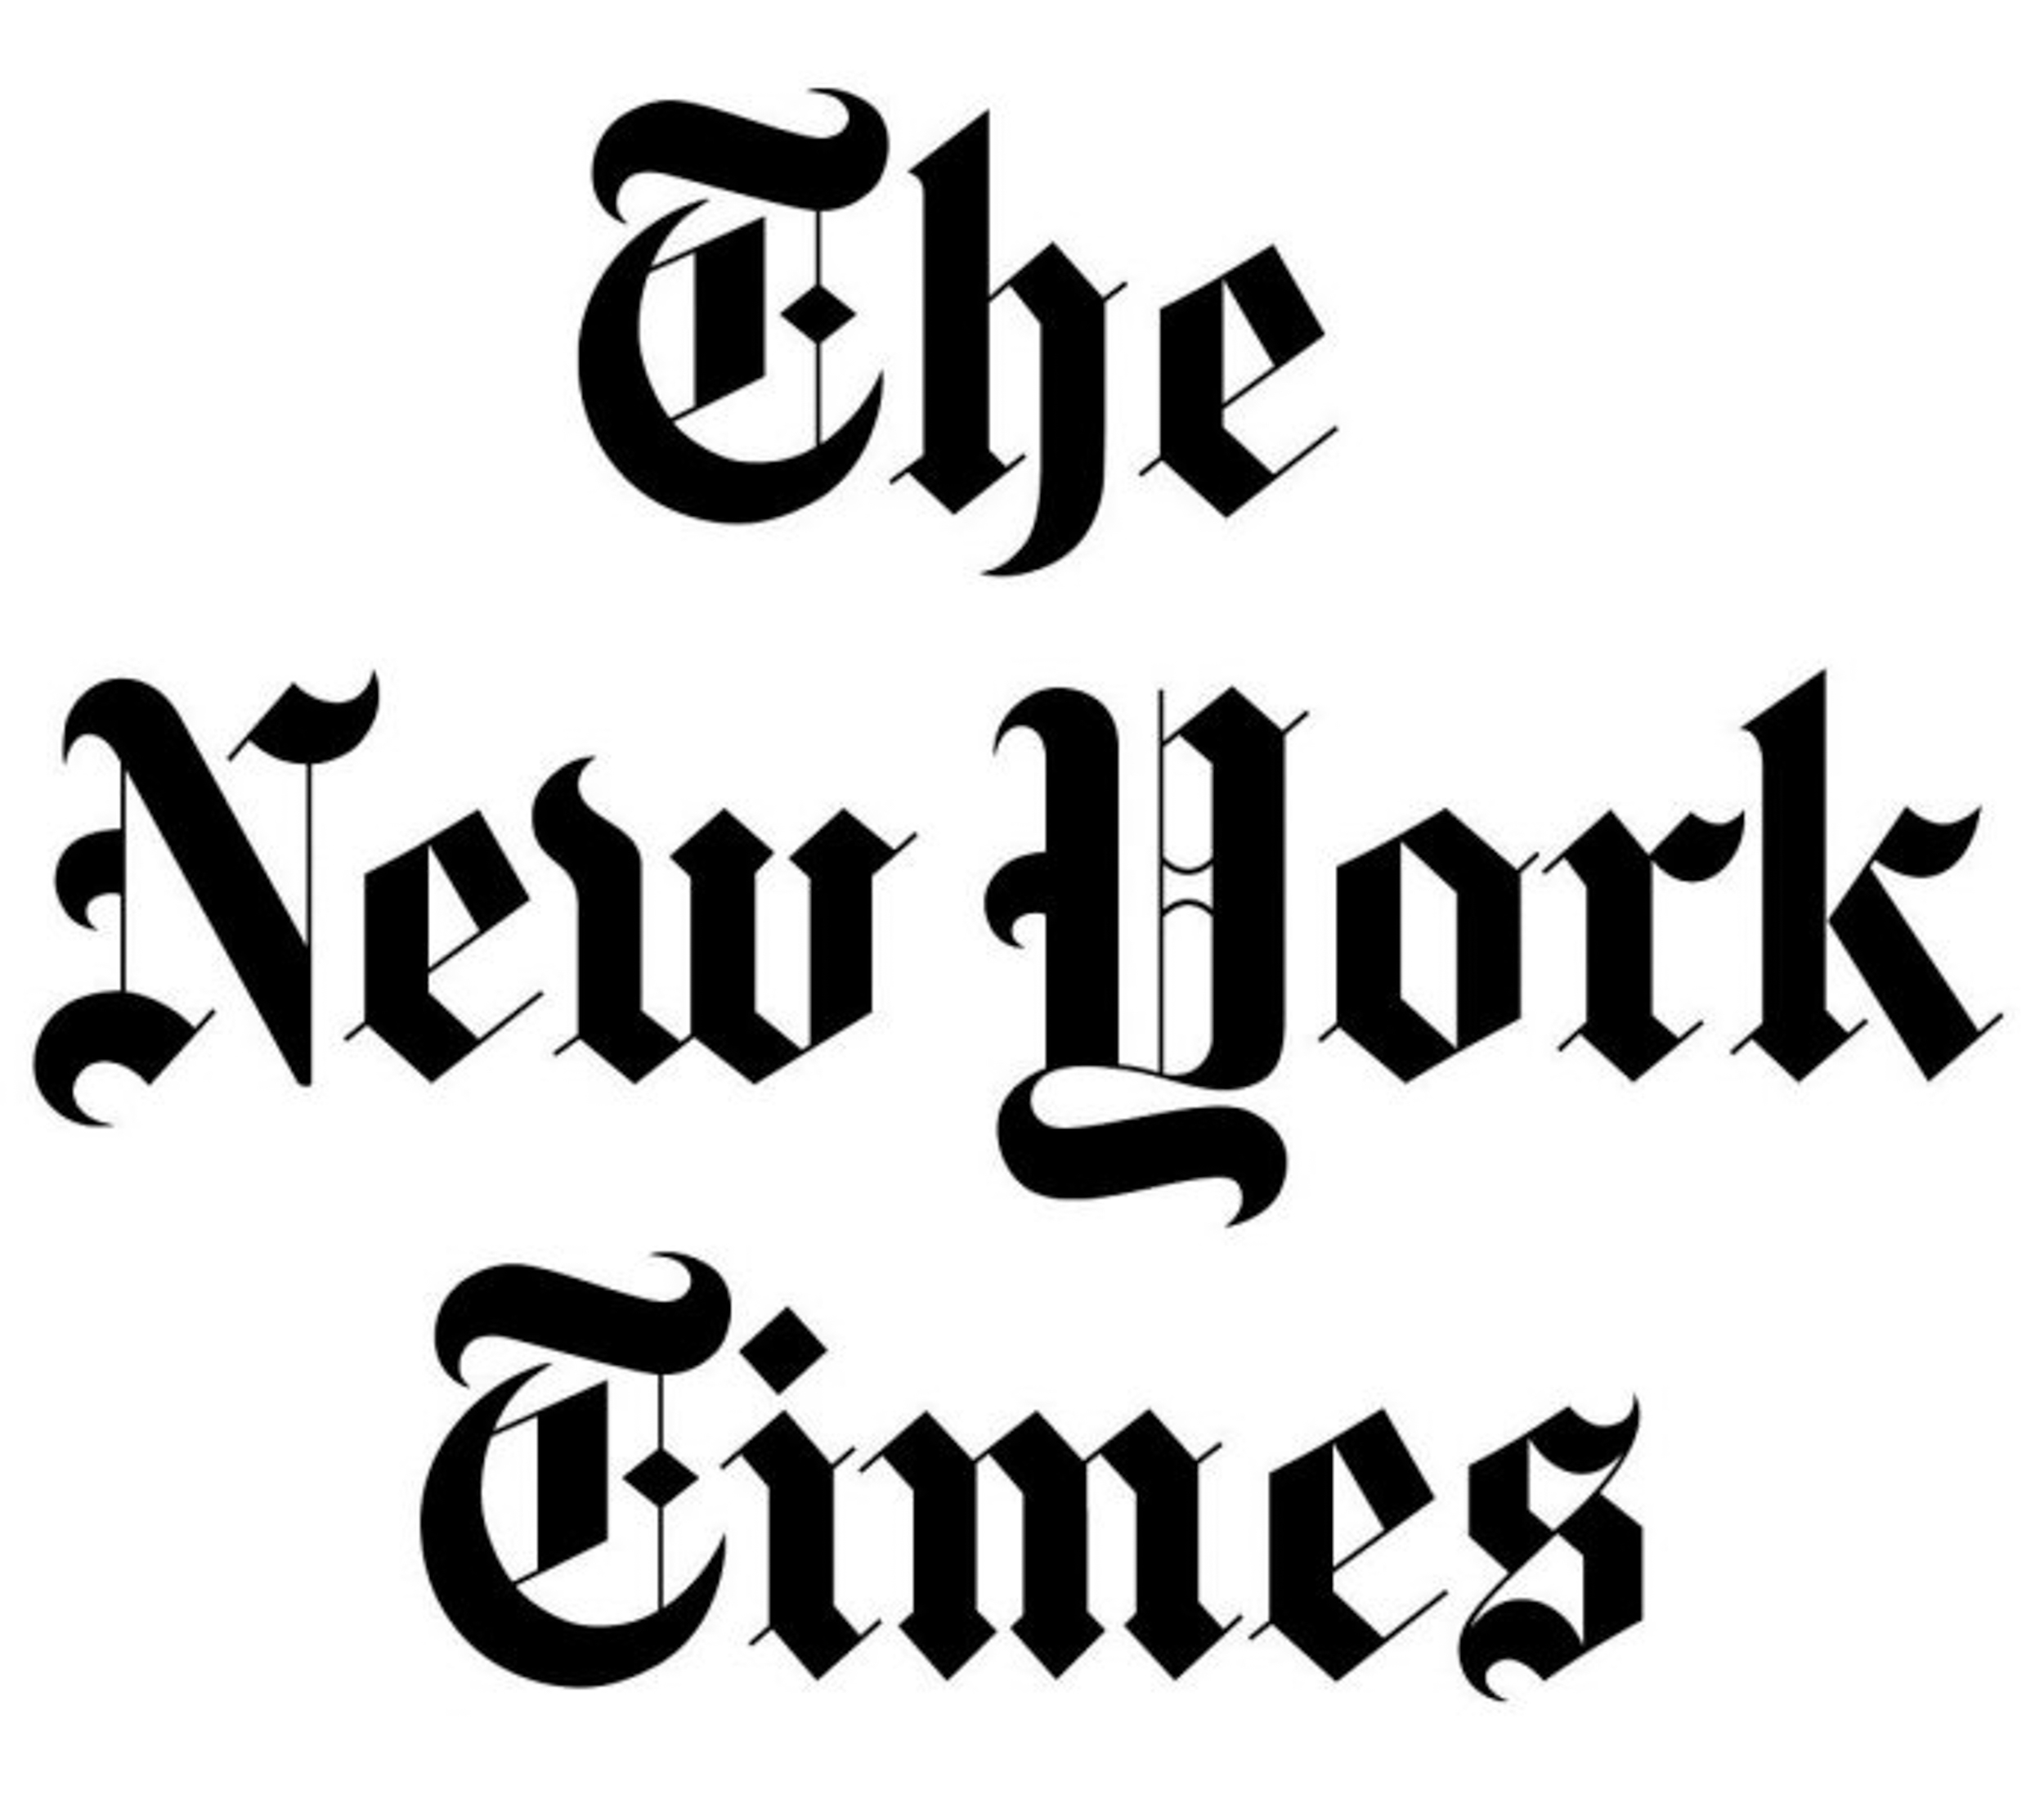 the-new-york-times-logo-696x611.jpg